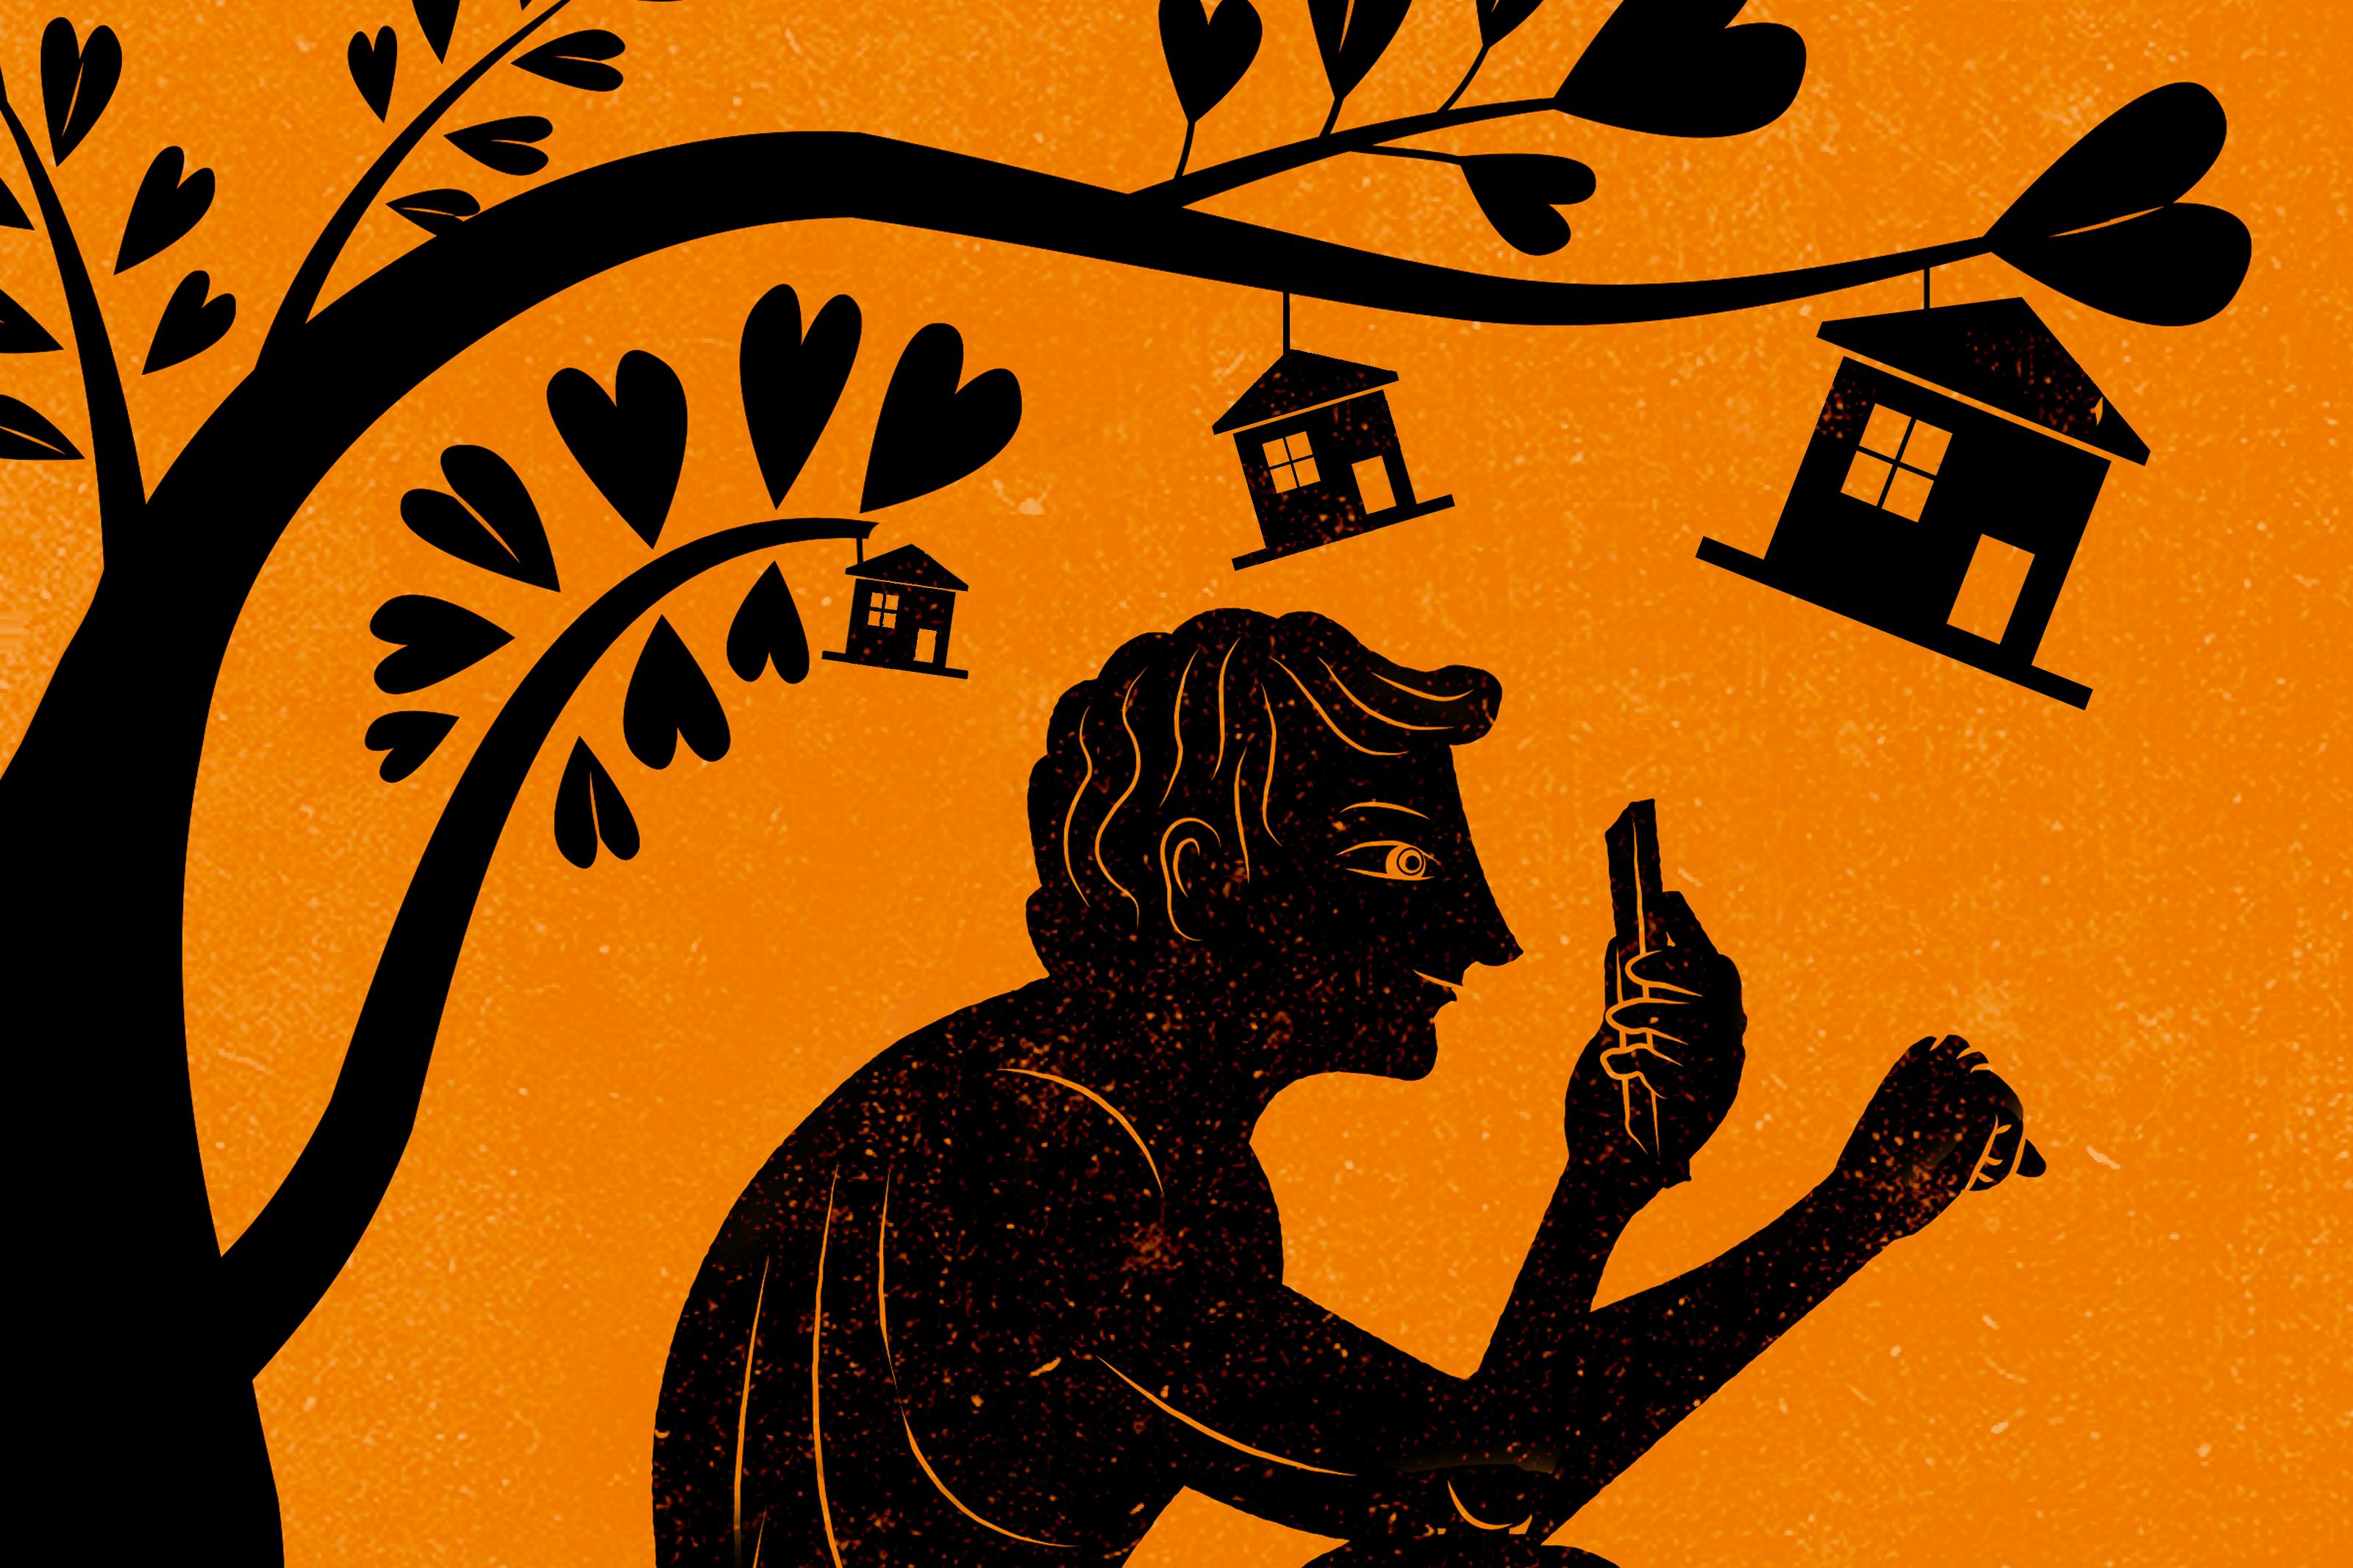 Illustration of man on a red-figured bowl